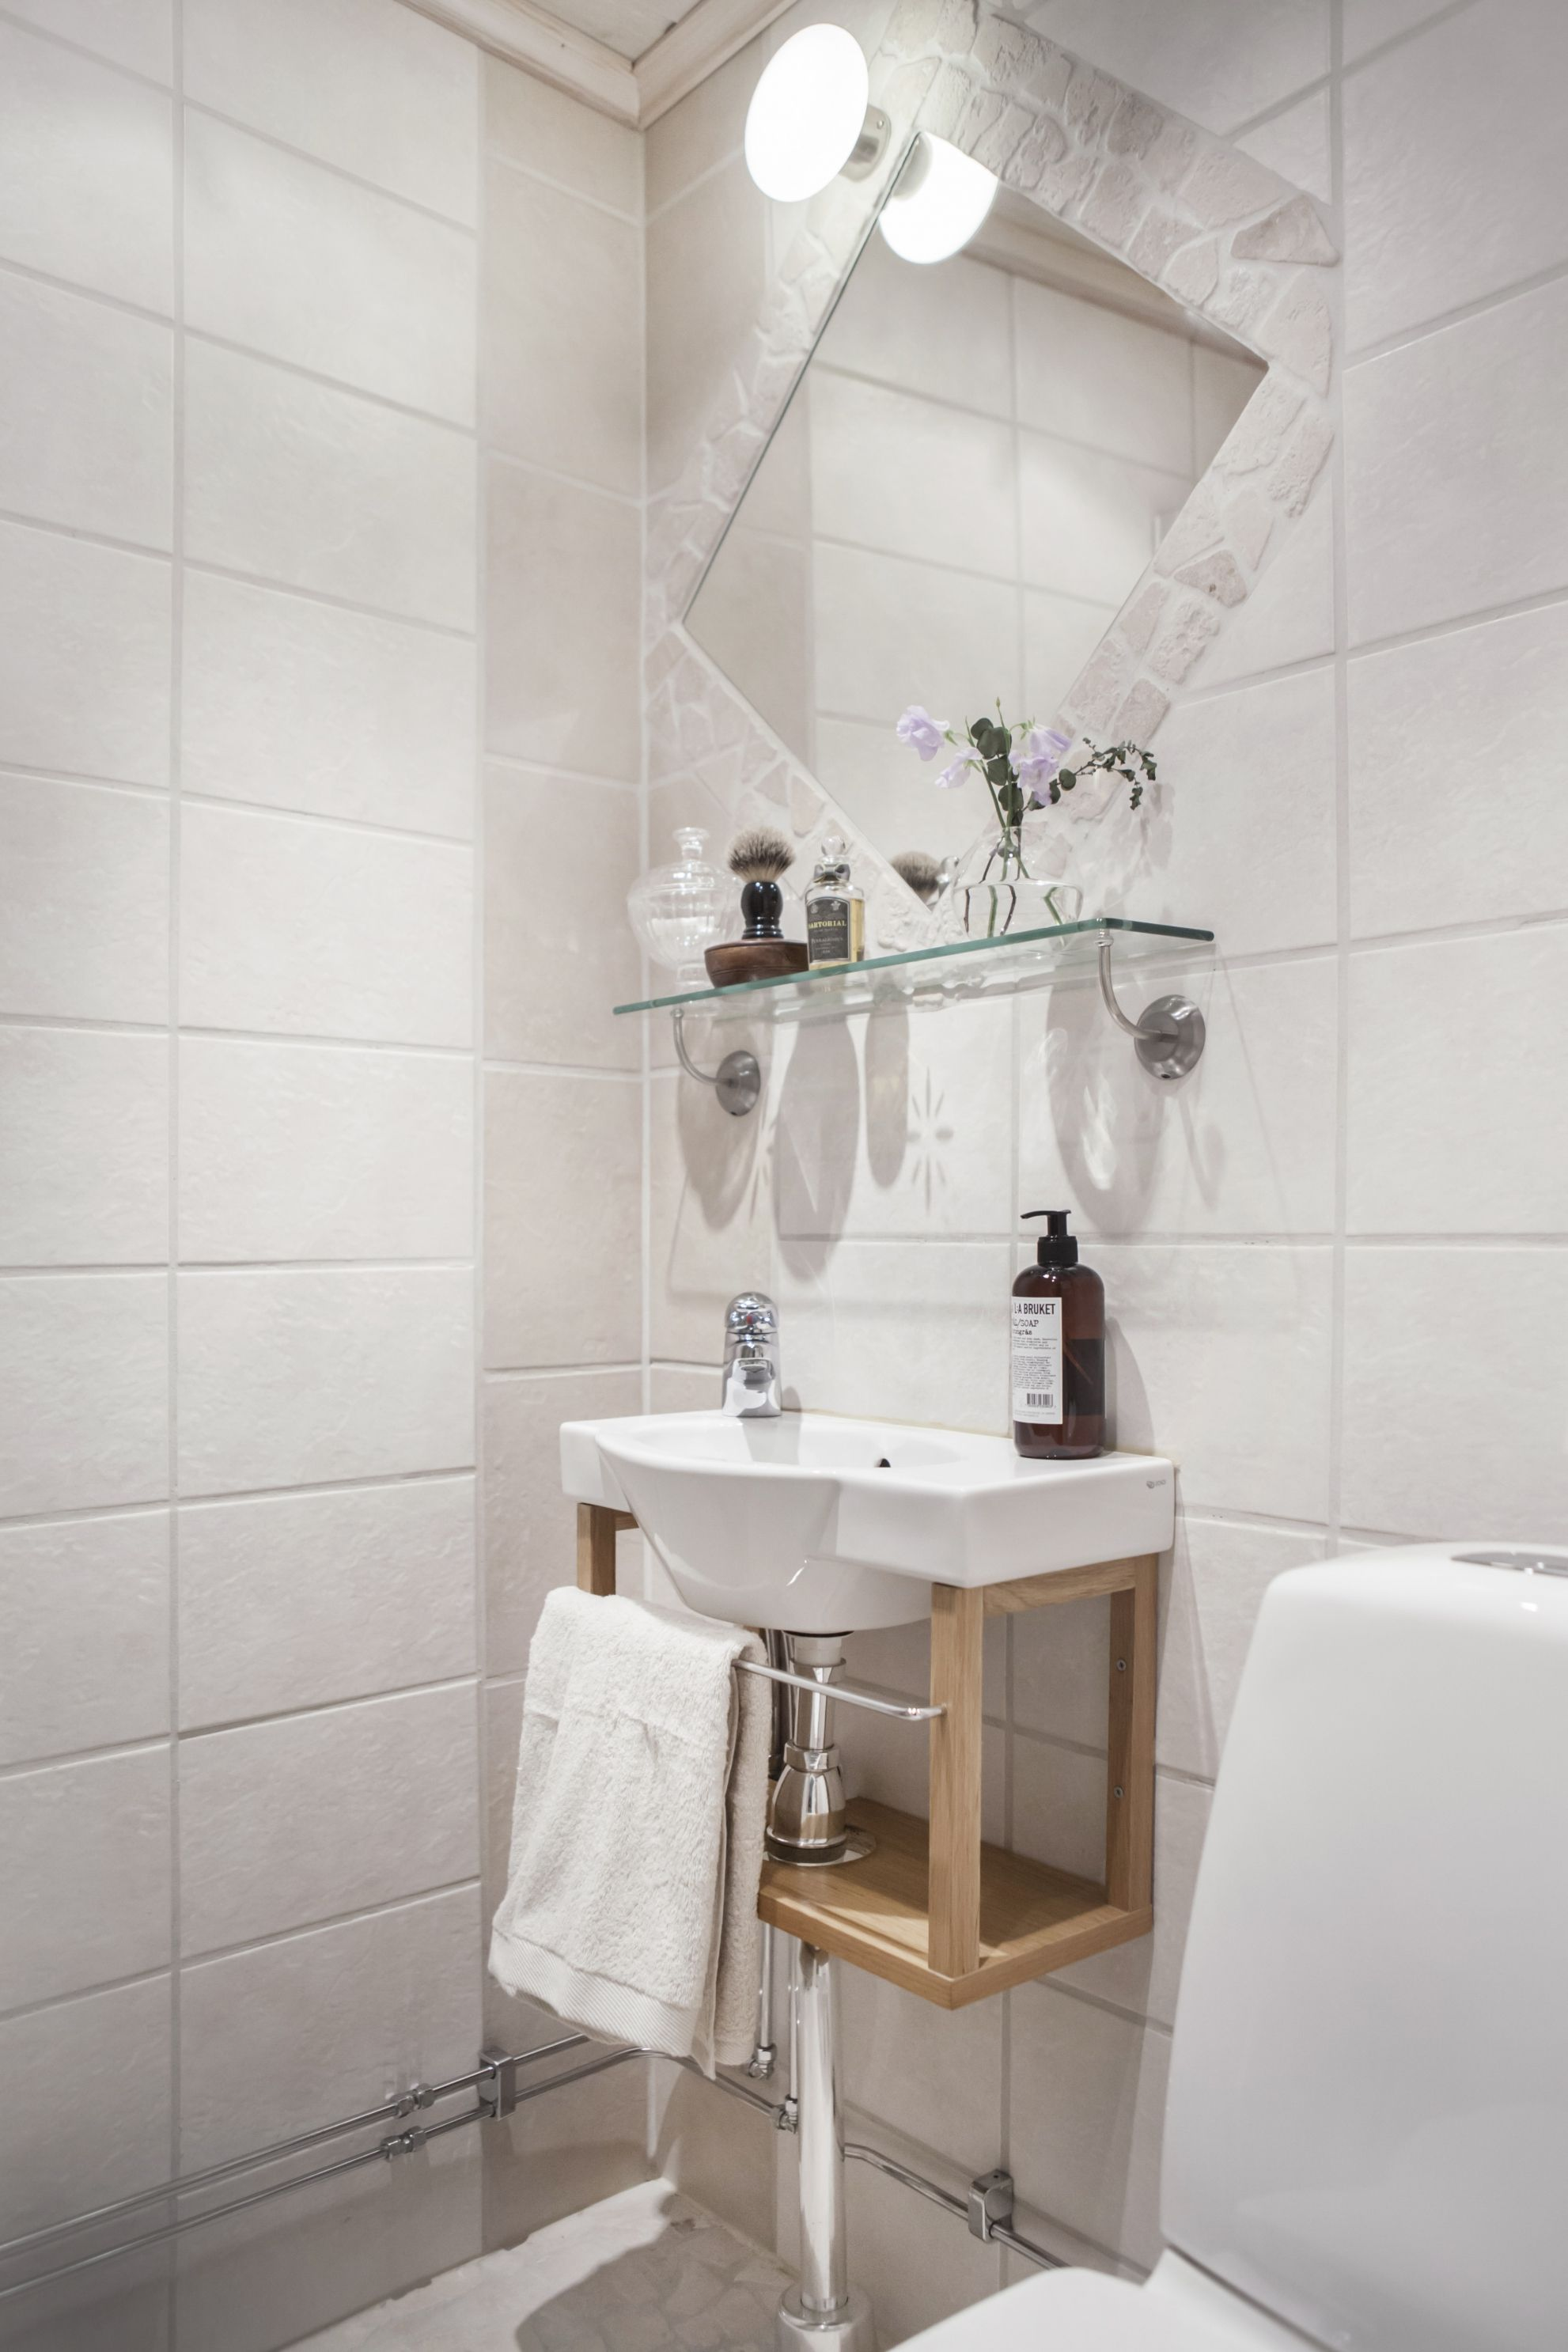 Small bathroom / small washbasin / Scandinavian style bathroom ...